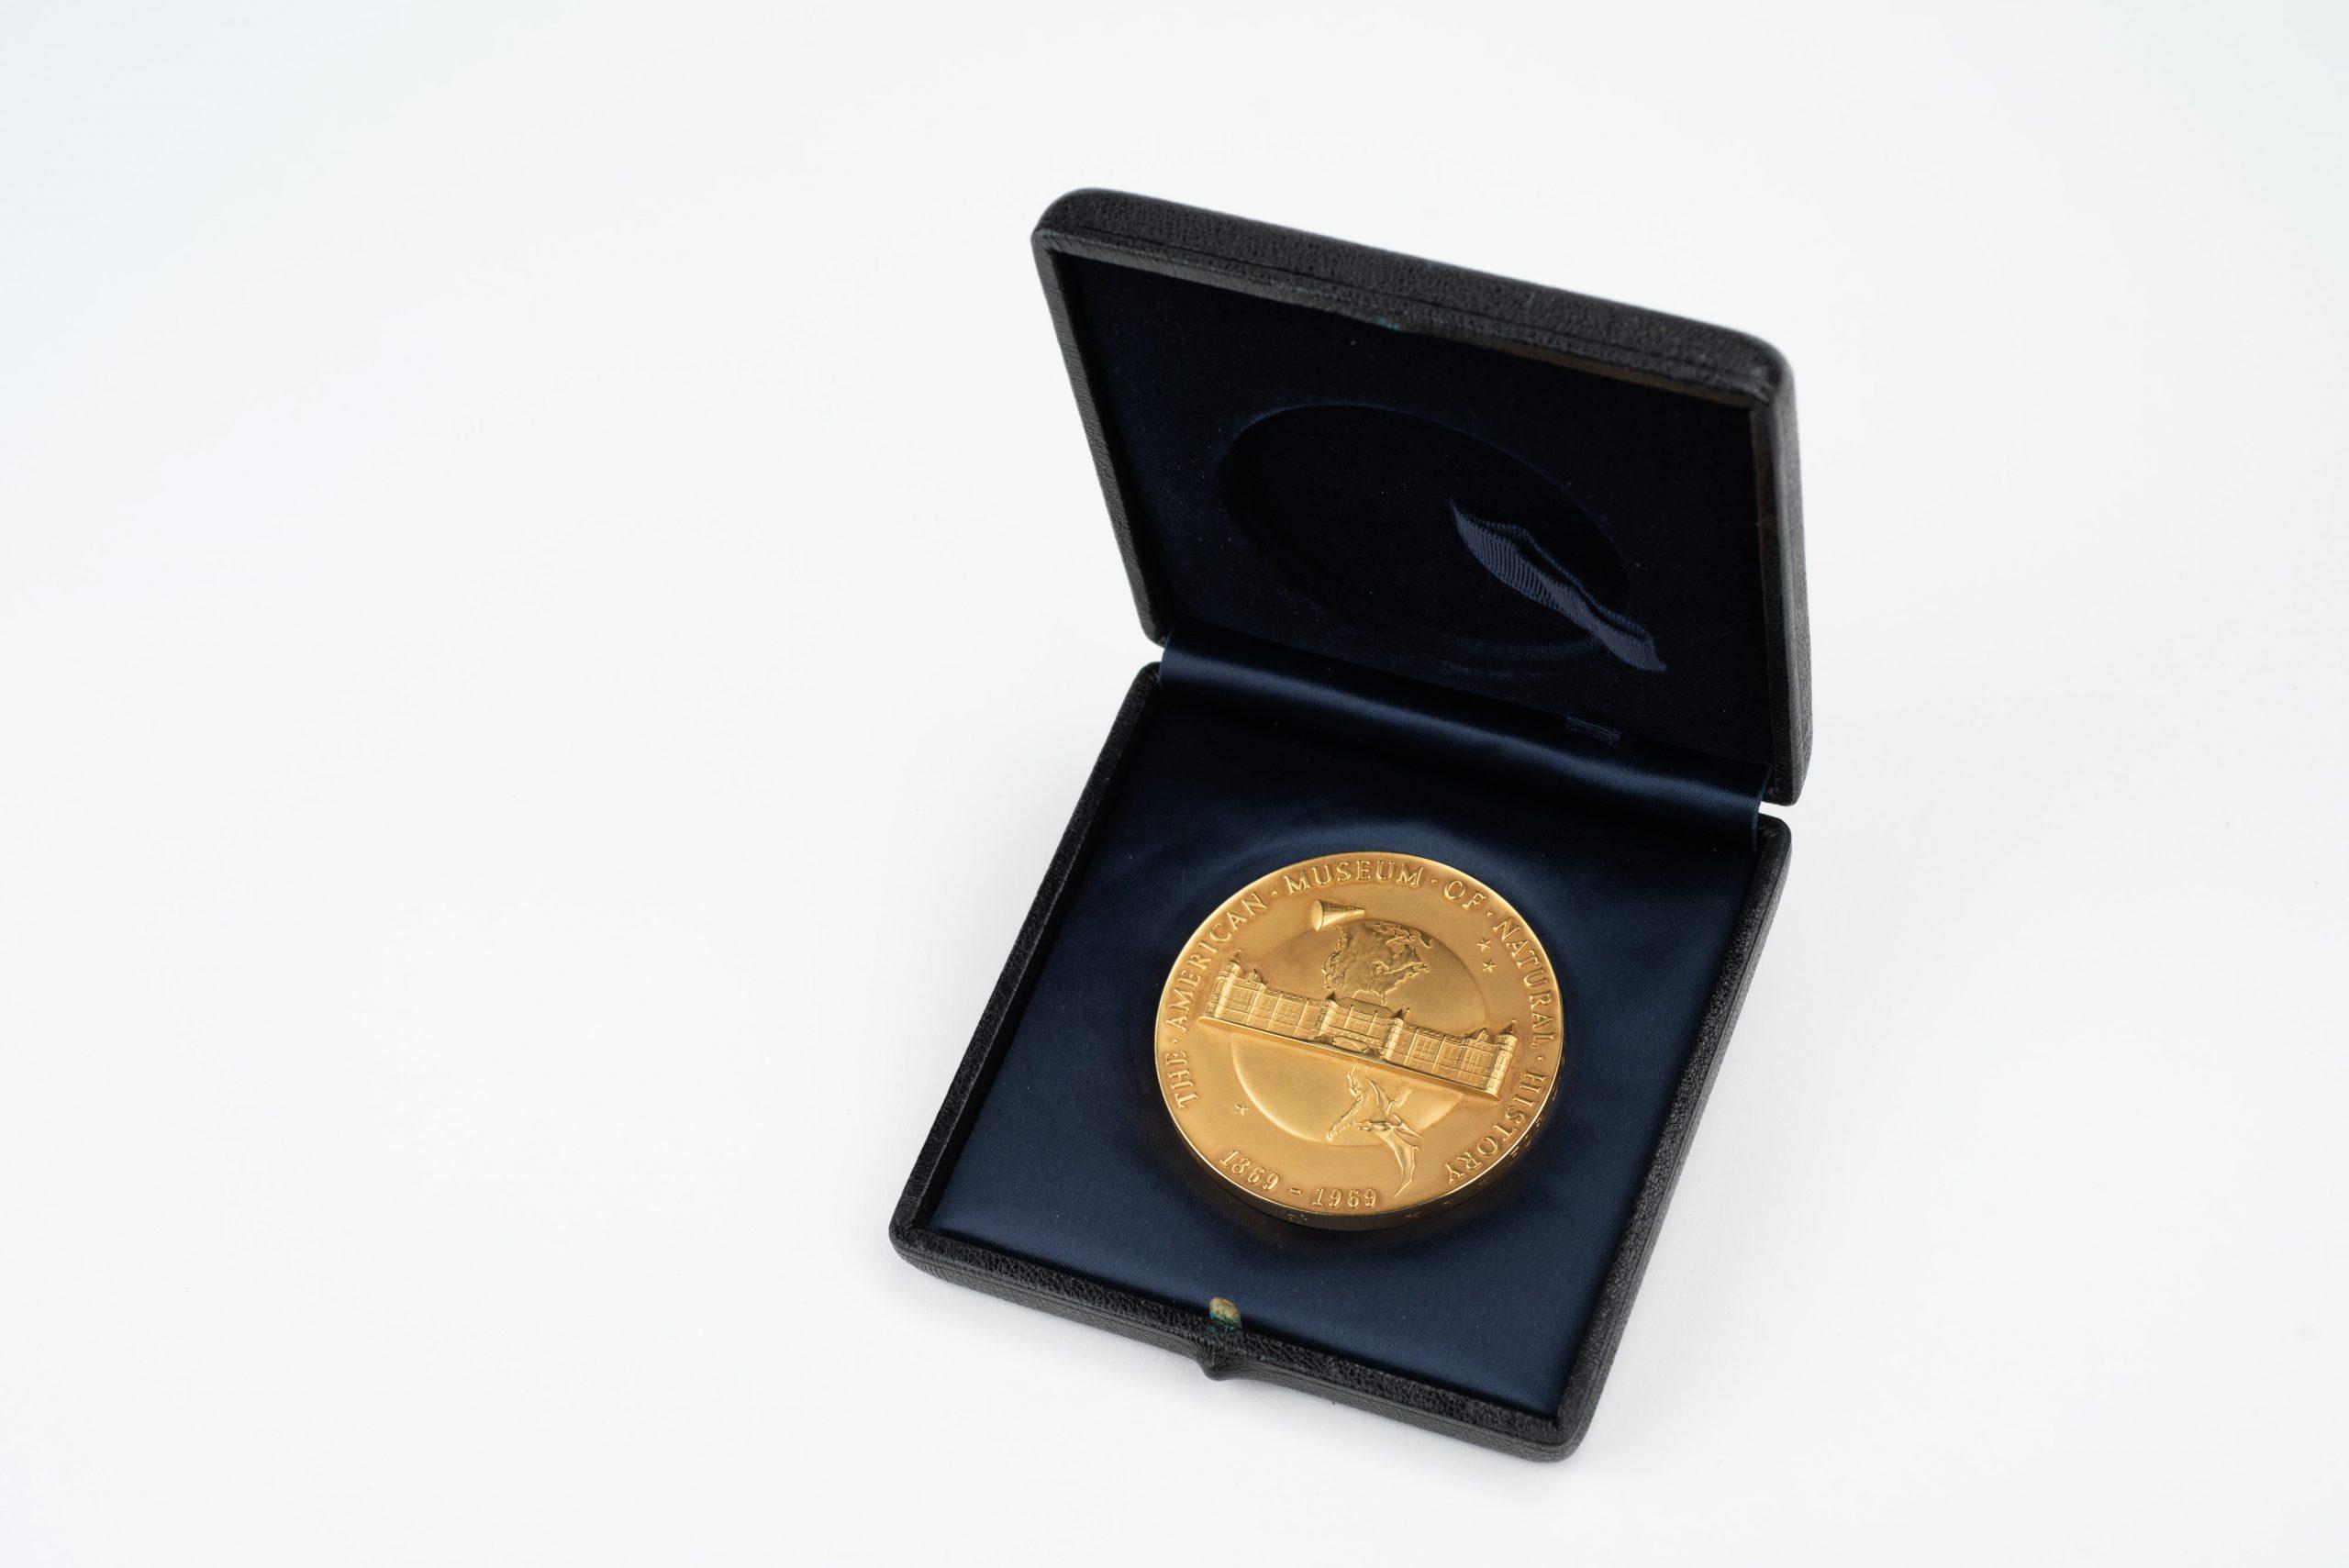 Libbie Hyman Medal (back view)